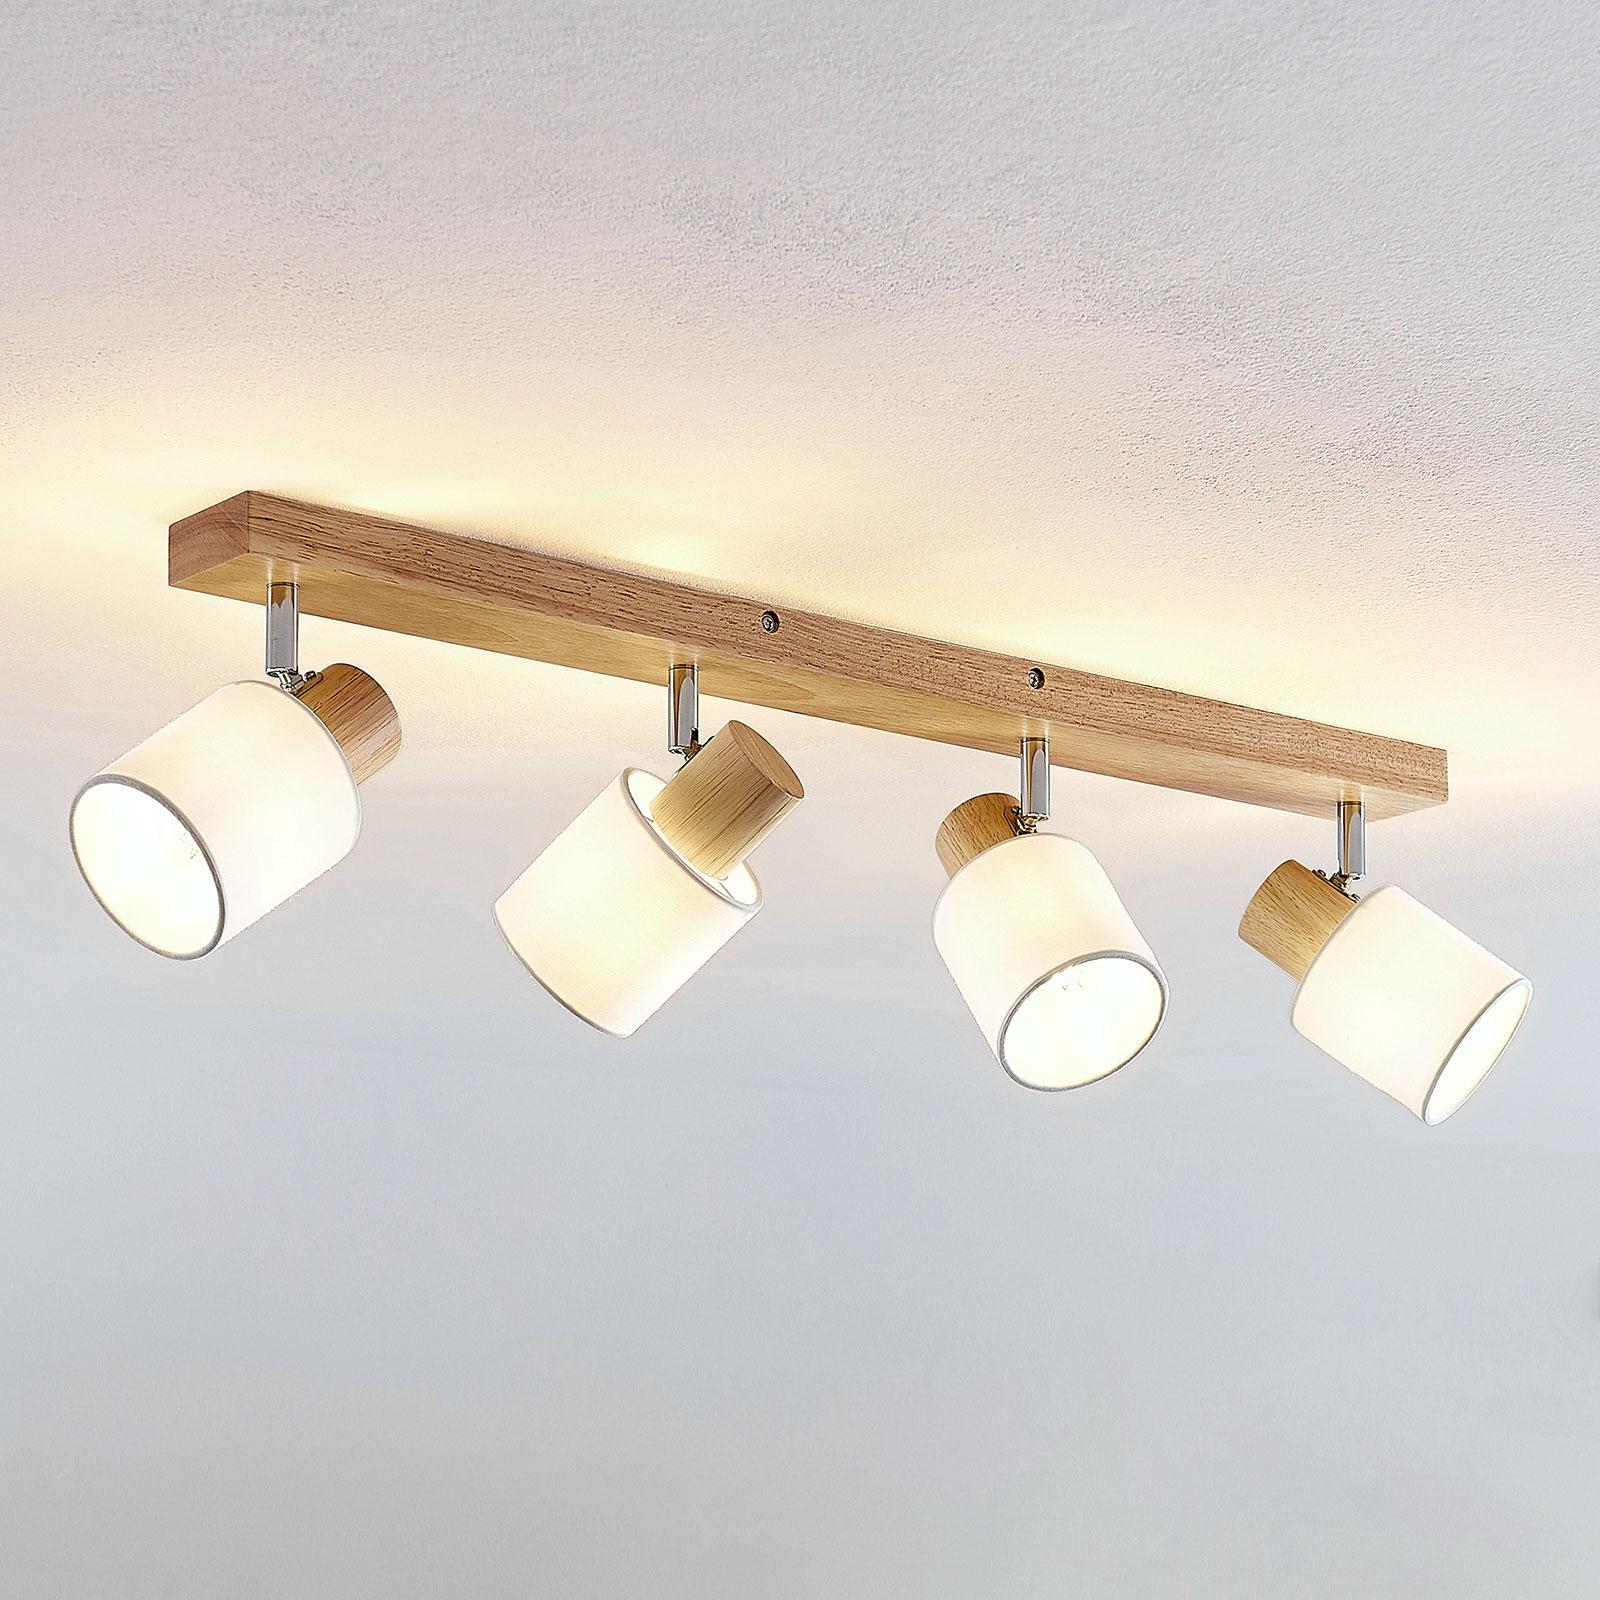 Lindby Wanessa foco de techo, 4 luces